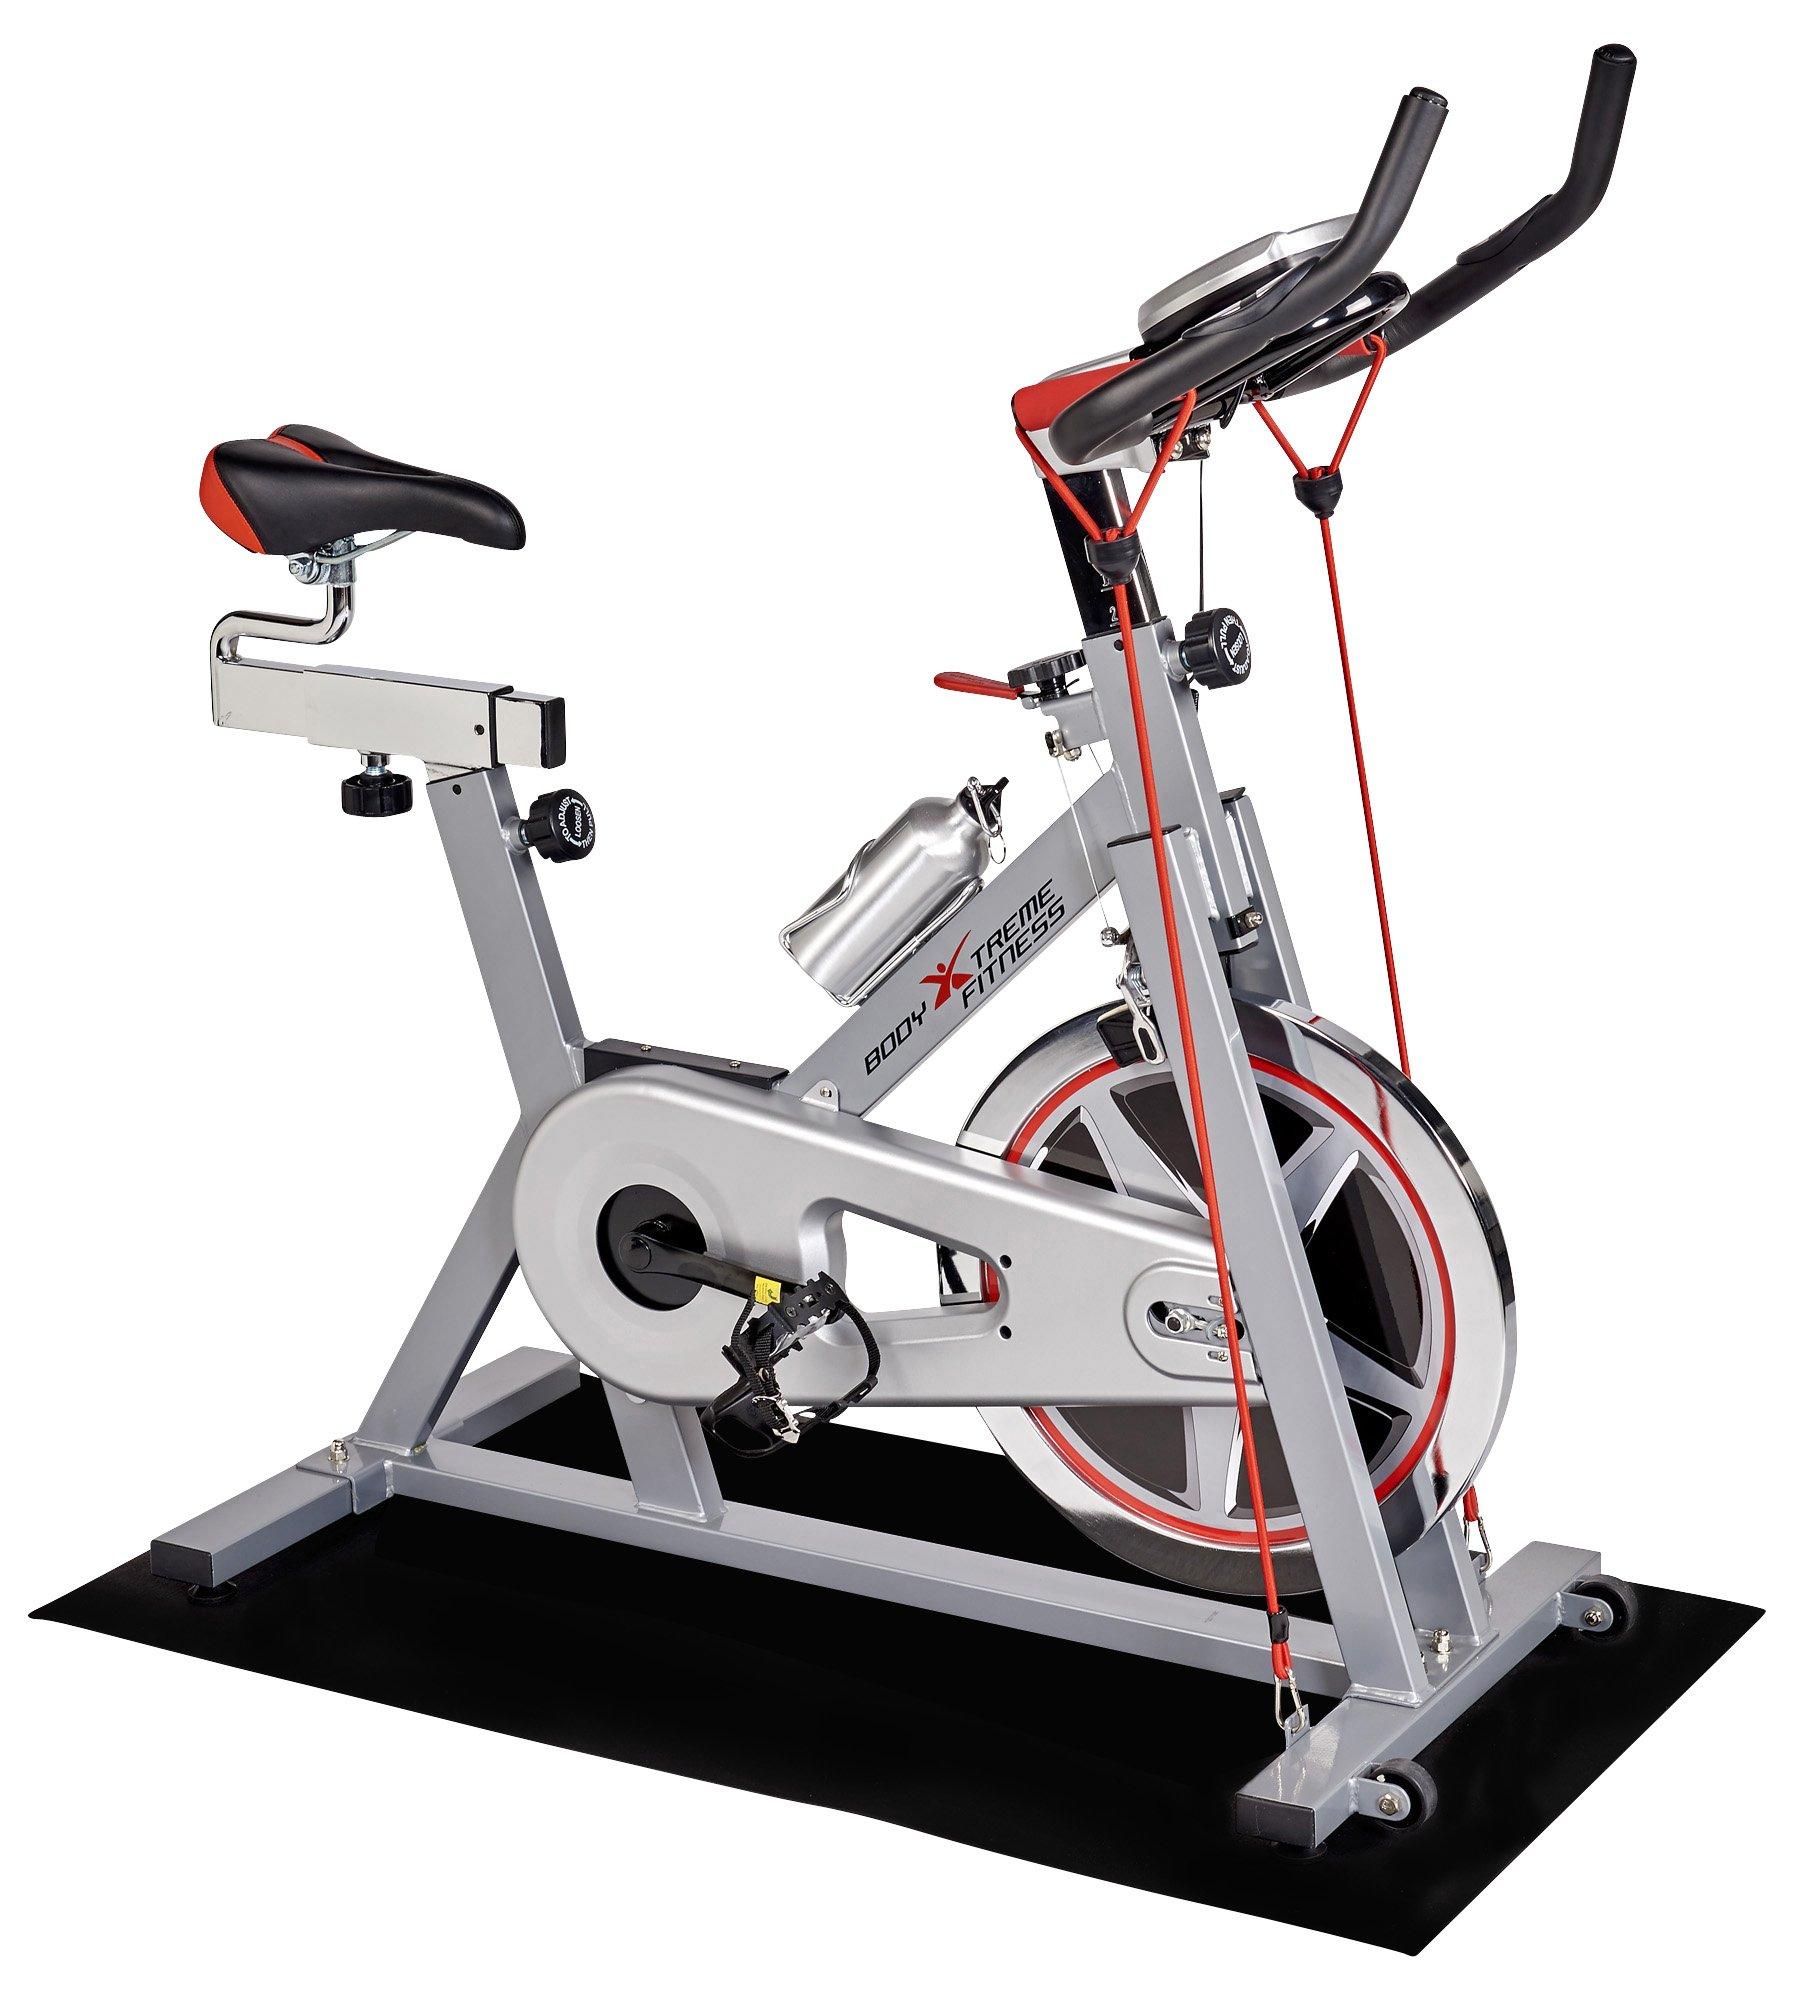 Cuerpo Xtreme Fitness ejercicio/paso/Aerobic/bicicleta alfombrilla ...